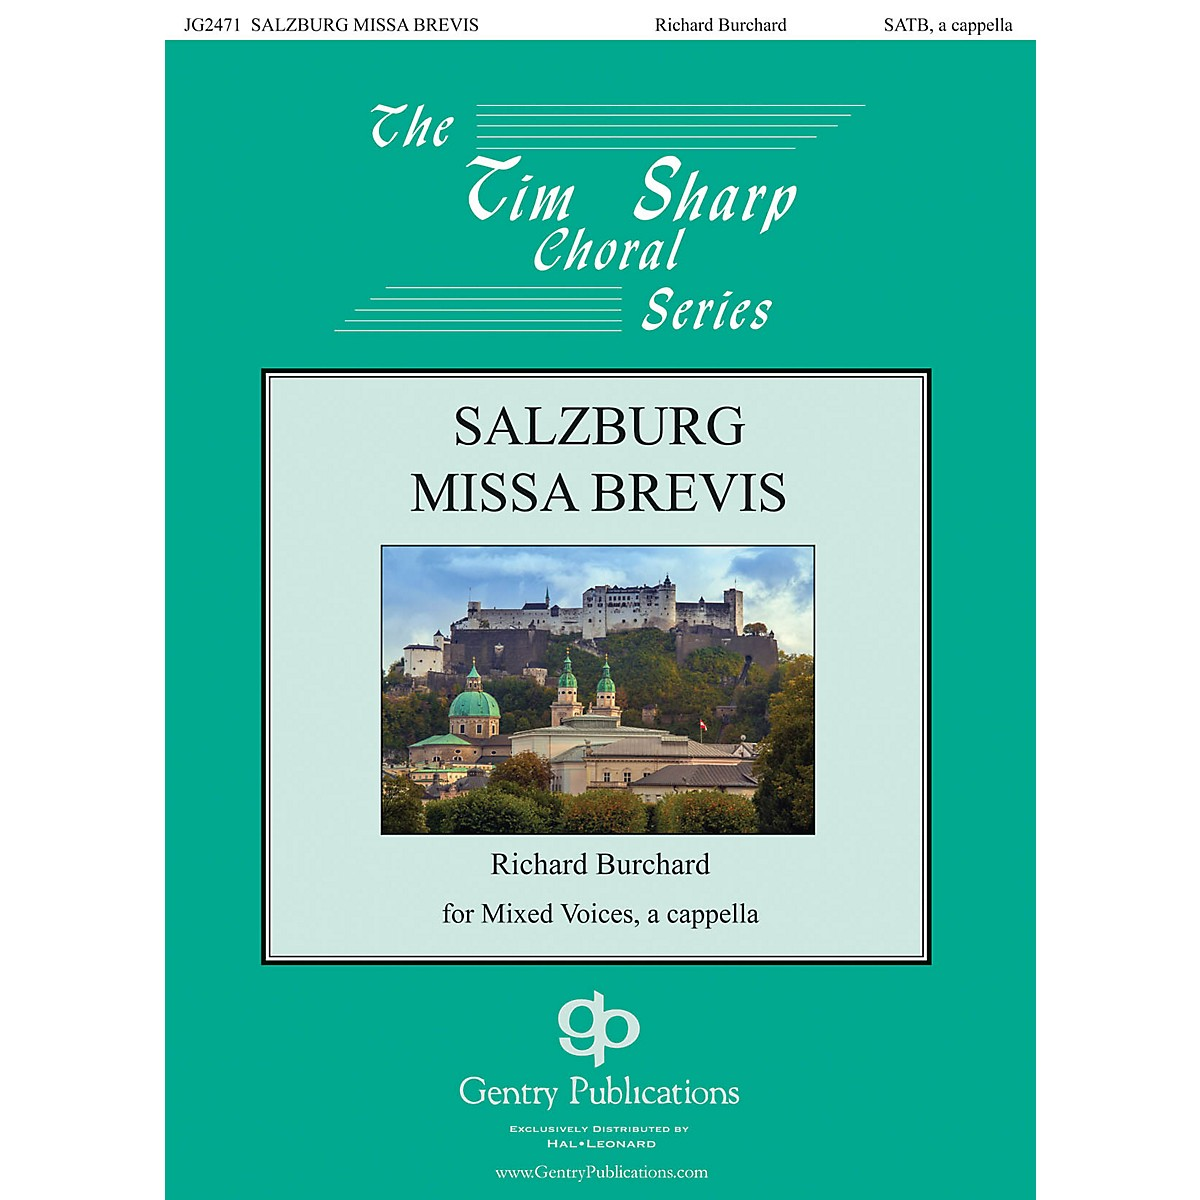 Gentry Publications Salzburg Missa Brevis SATB a cappella composed by Richard Burchard